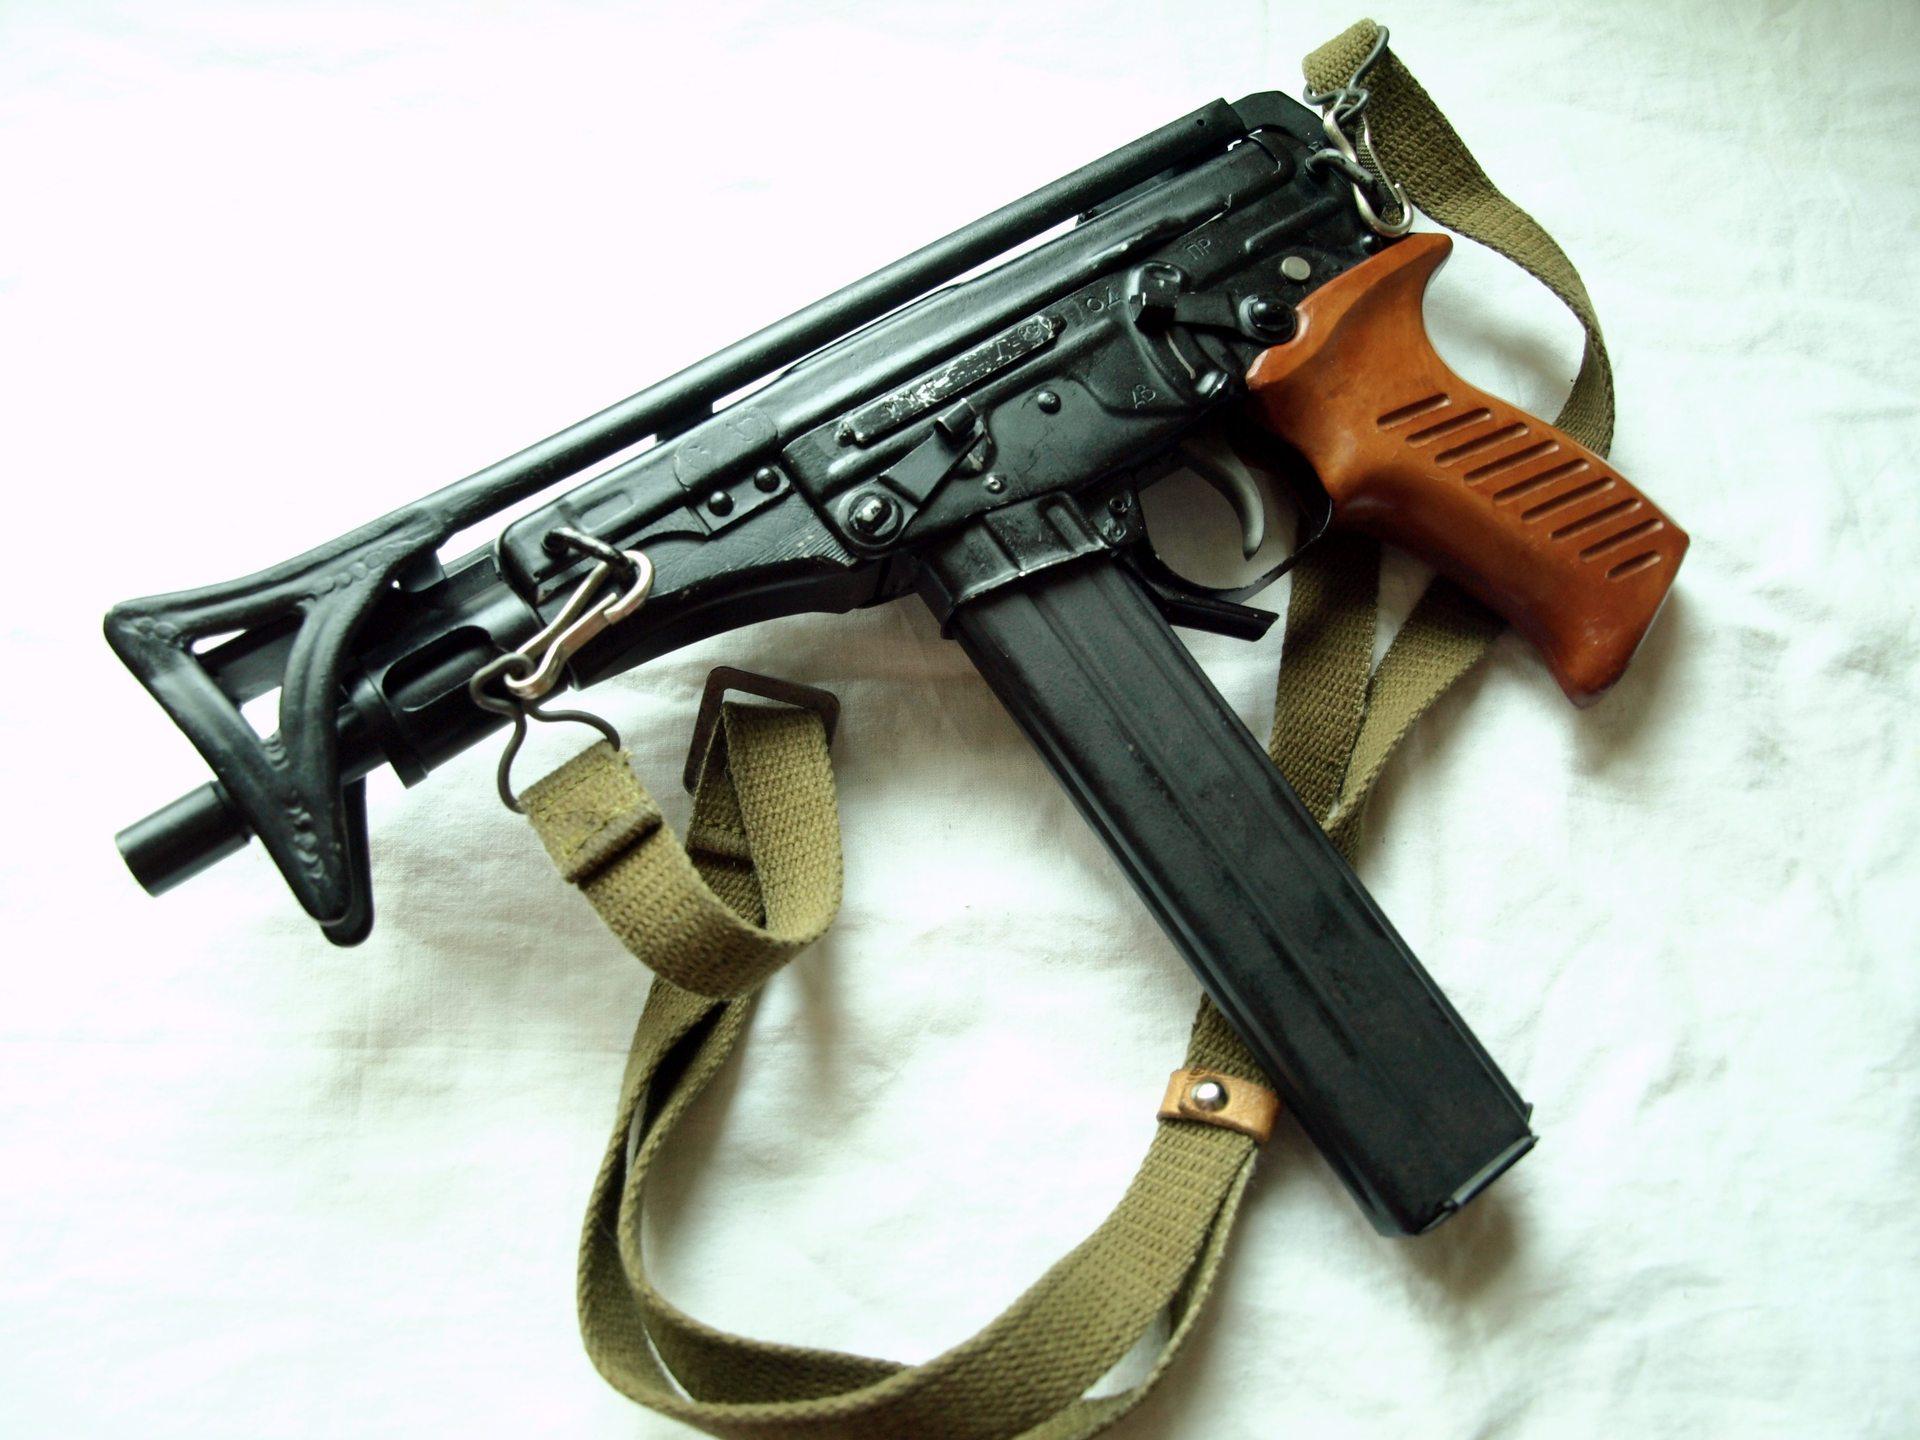 Пистолеты-пулеметы ОЦ-02 «Кипарис», ПП-71 КЕДР, «Клин» и АЕК-919 К «Каштан»